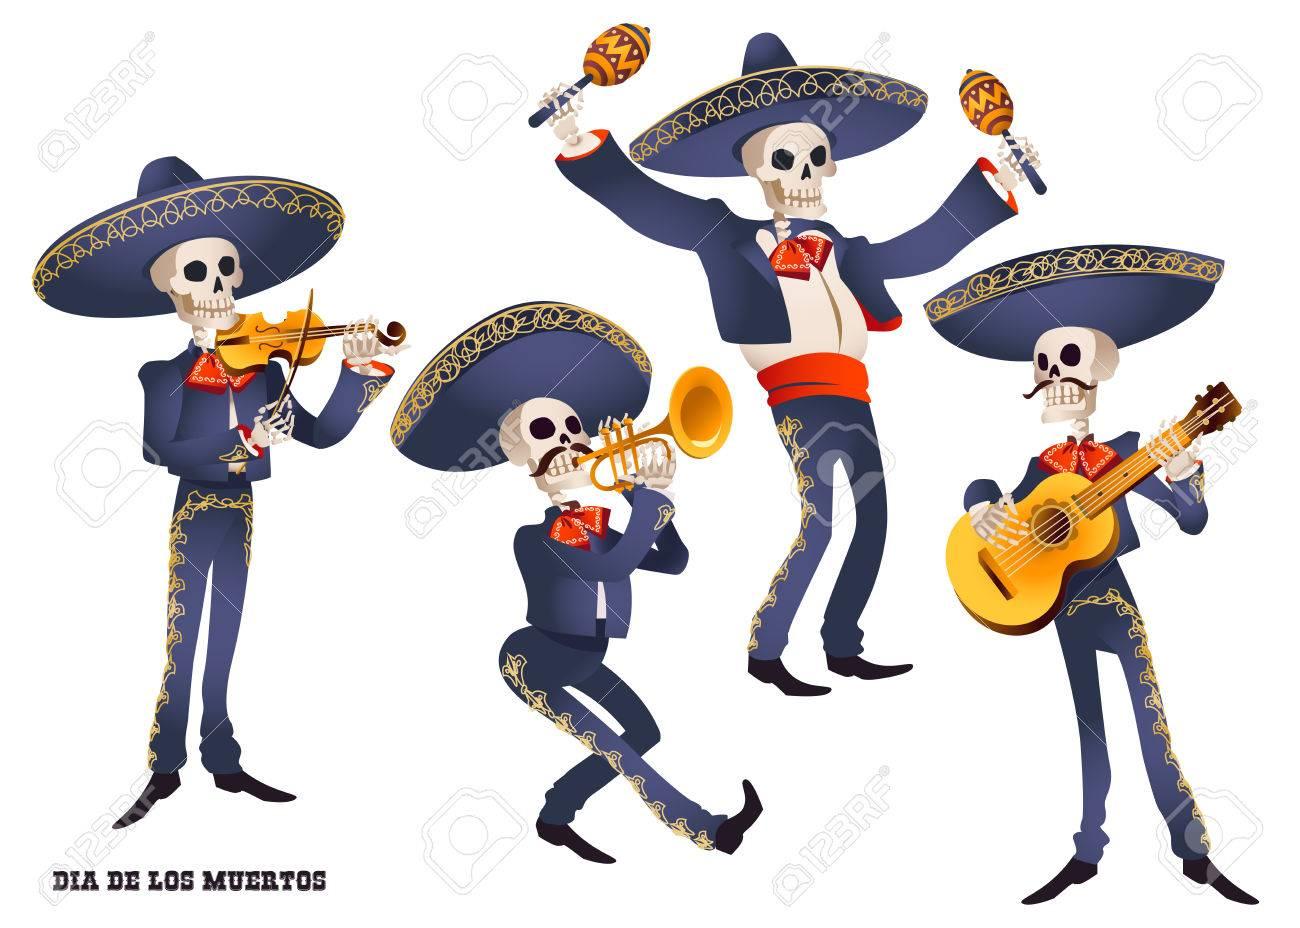 Dia de Muertos. Mariachi band musician of skeletons. Mexican tradition. Vector illustration. - 85357051